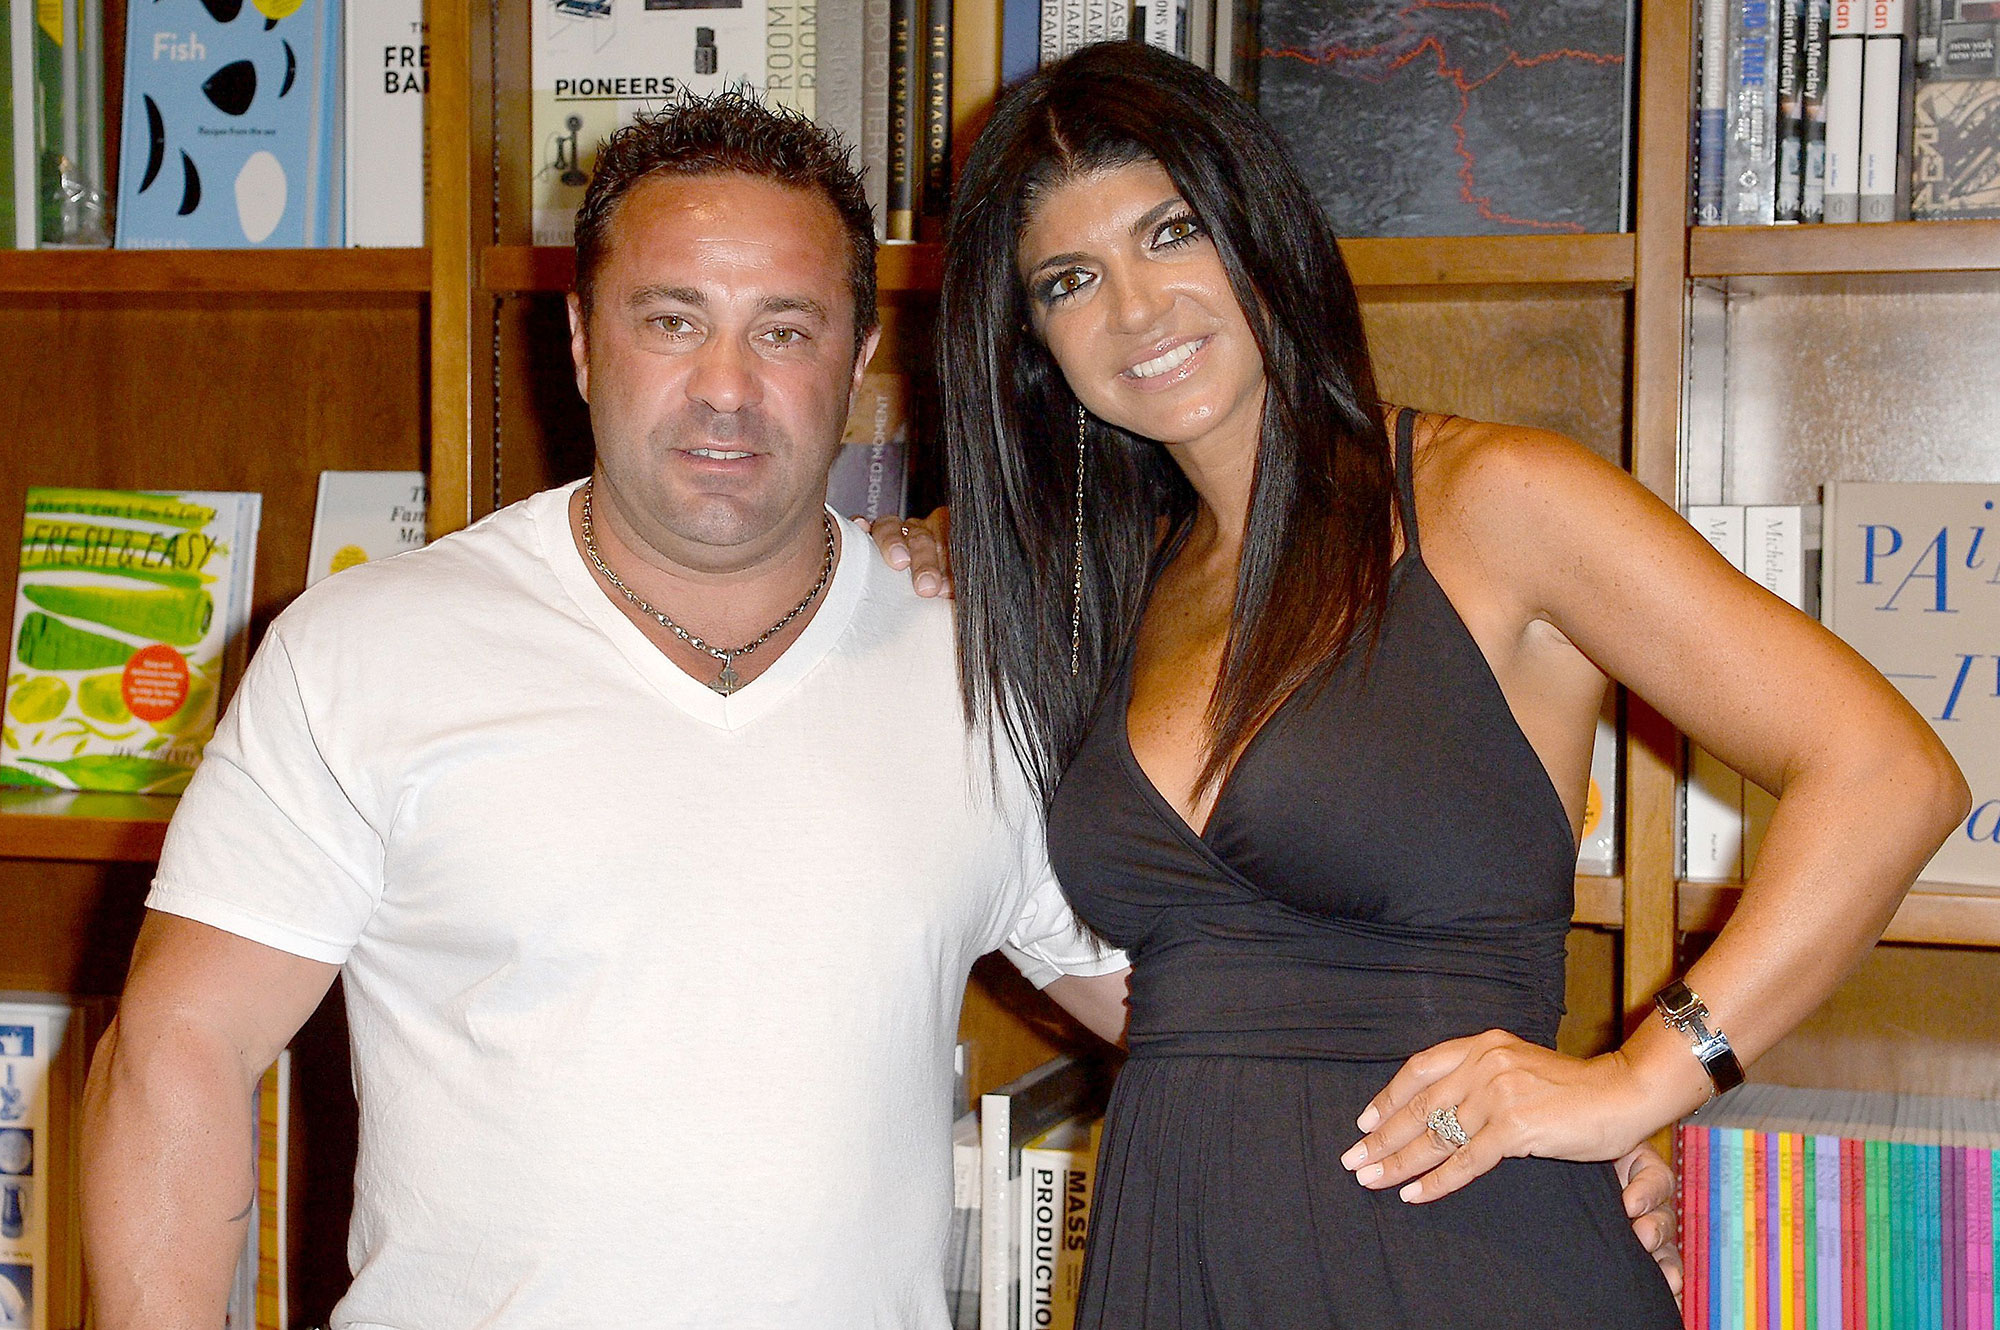 Joe Giudice and Teresa Giudice